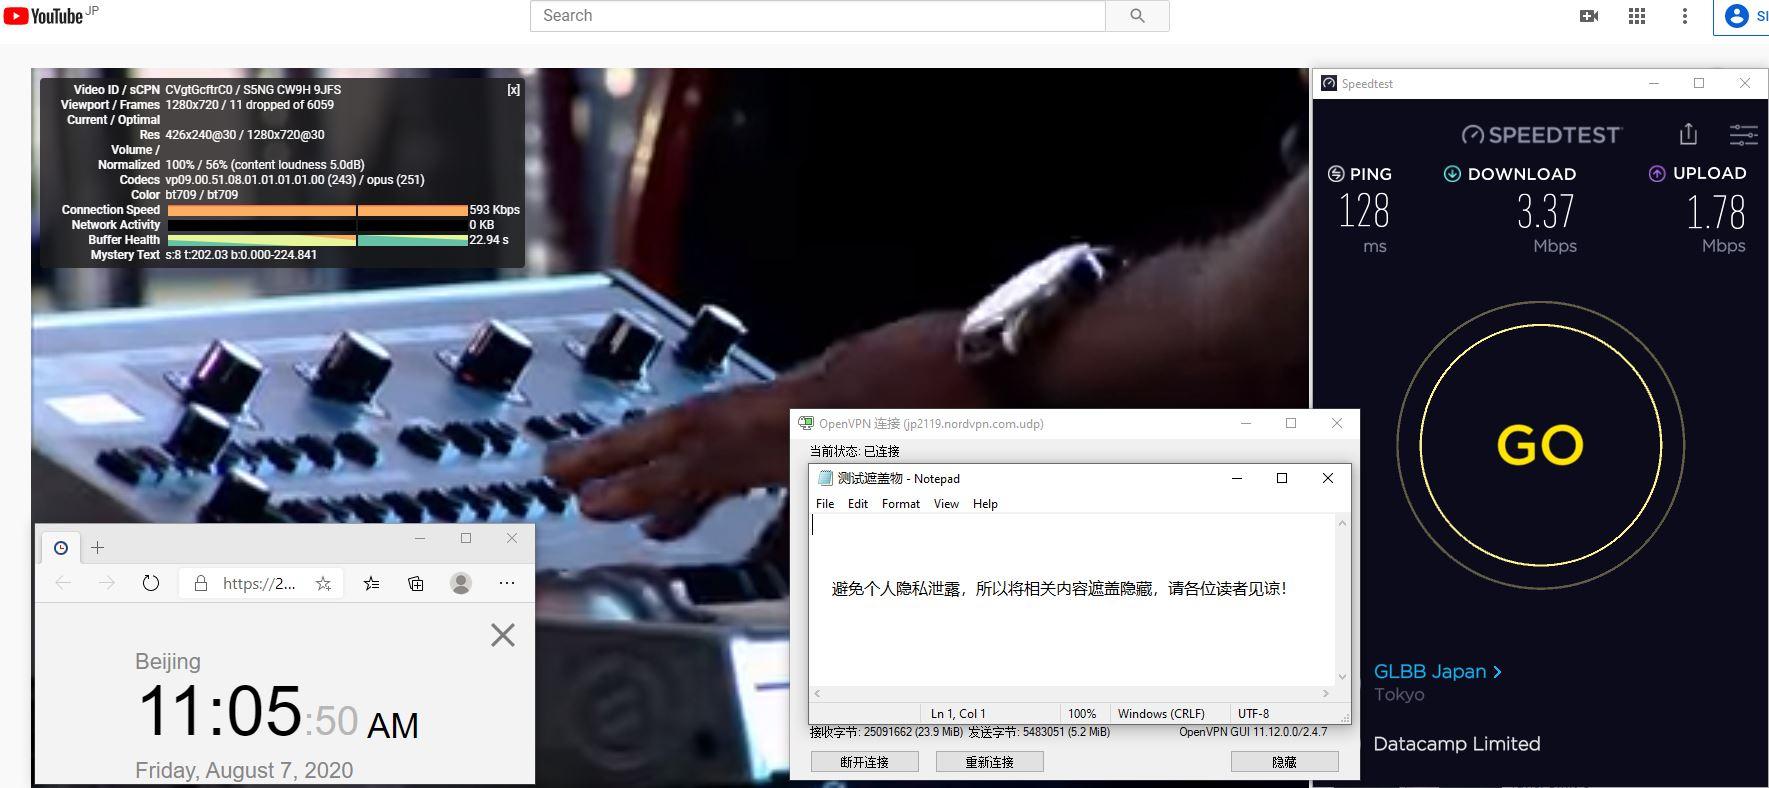 Windows10 NordVPN Open VPN GUI jp2119 中国VPN 翻墙 科学上网 翻墙速度测试 - 20200807